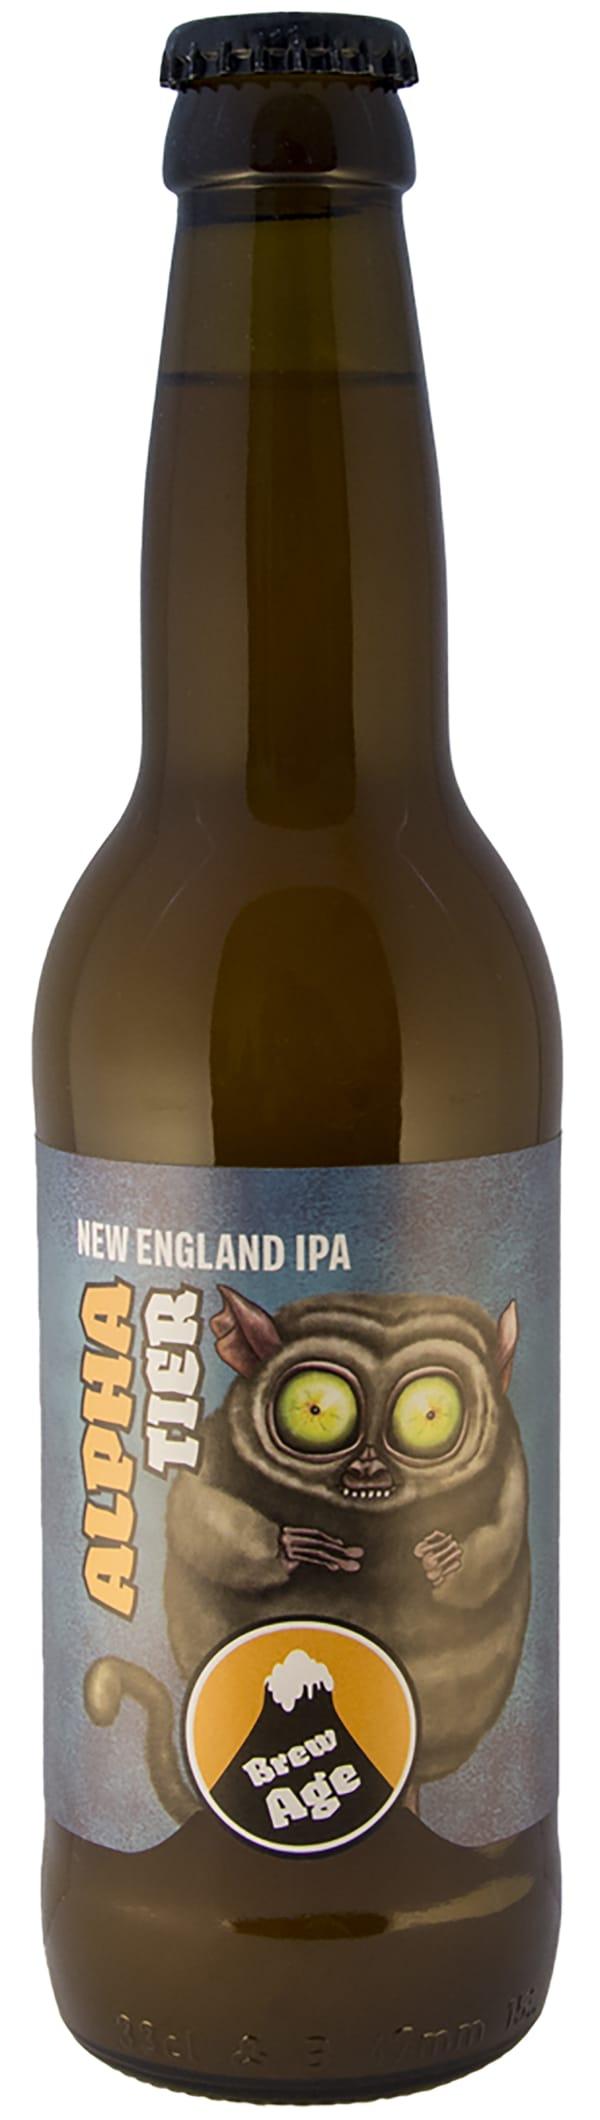 Brew Age Alphatier New England IPA